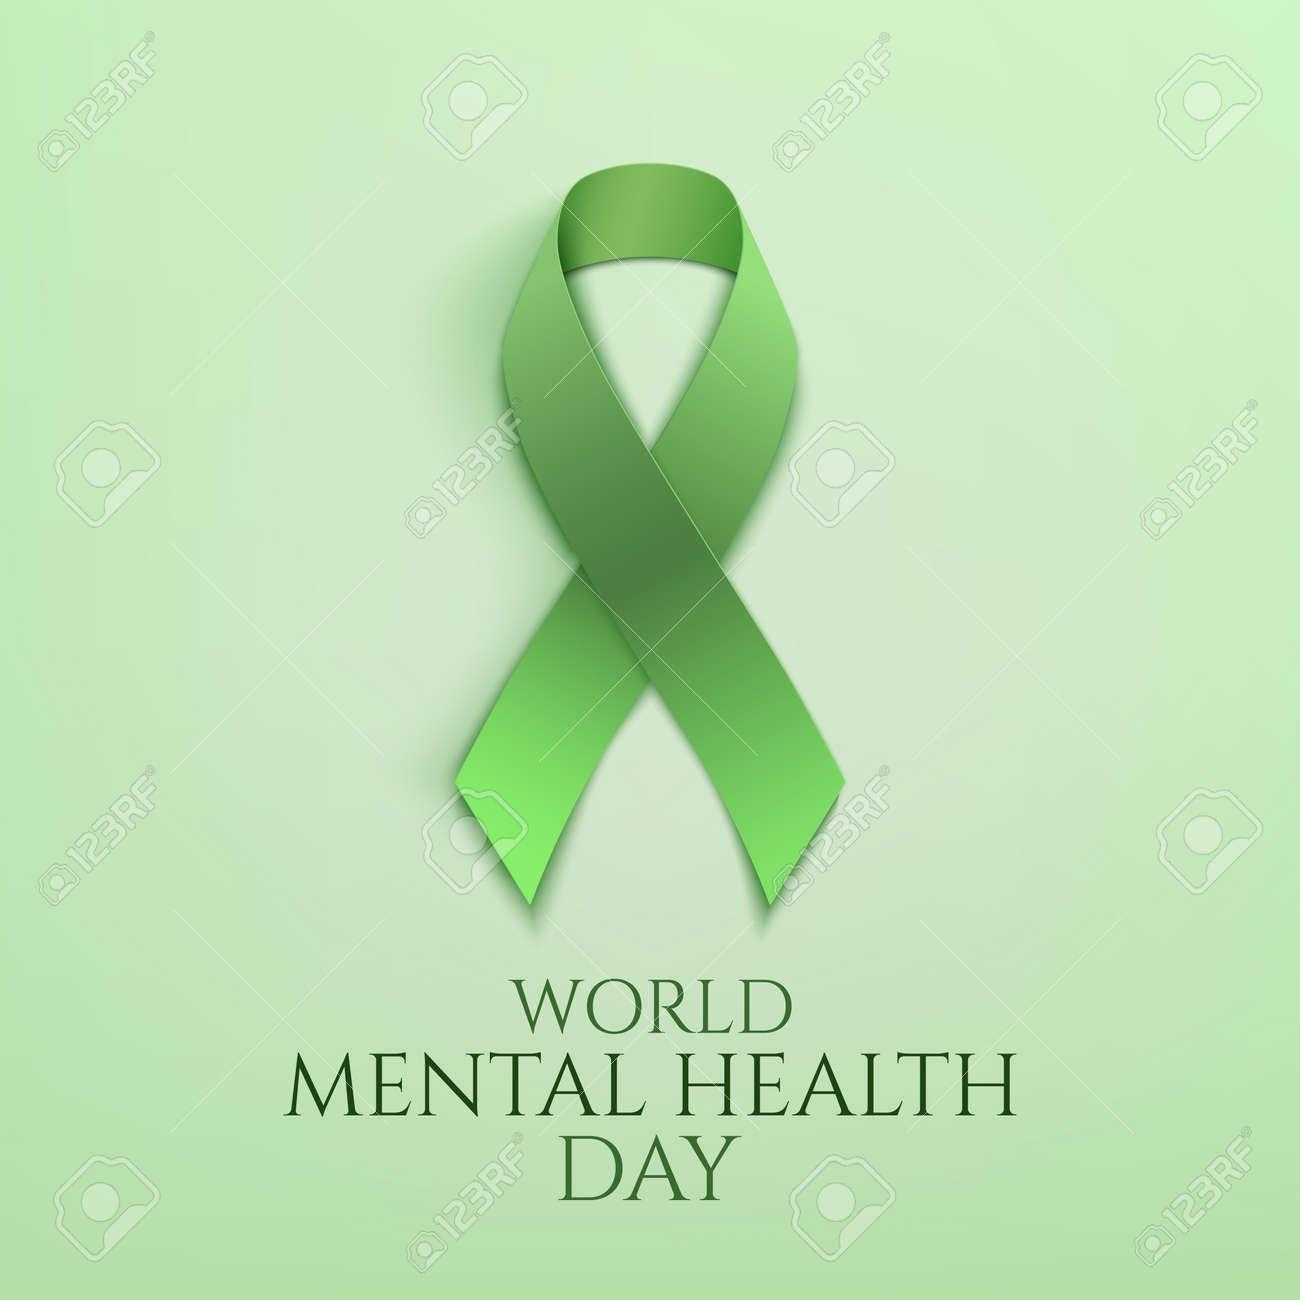 World mental health day background. - 85279194